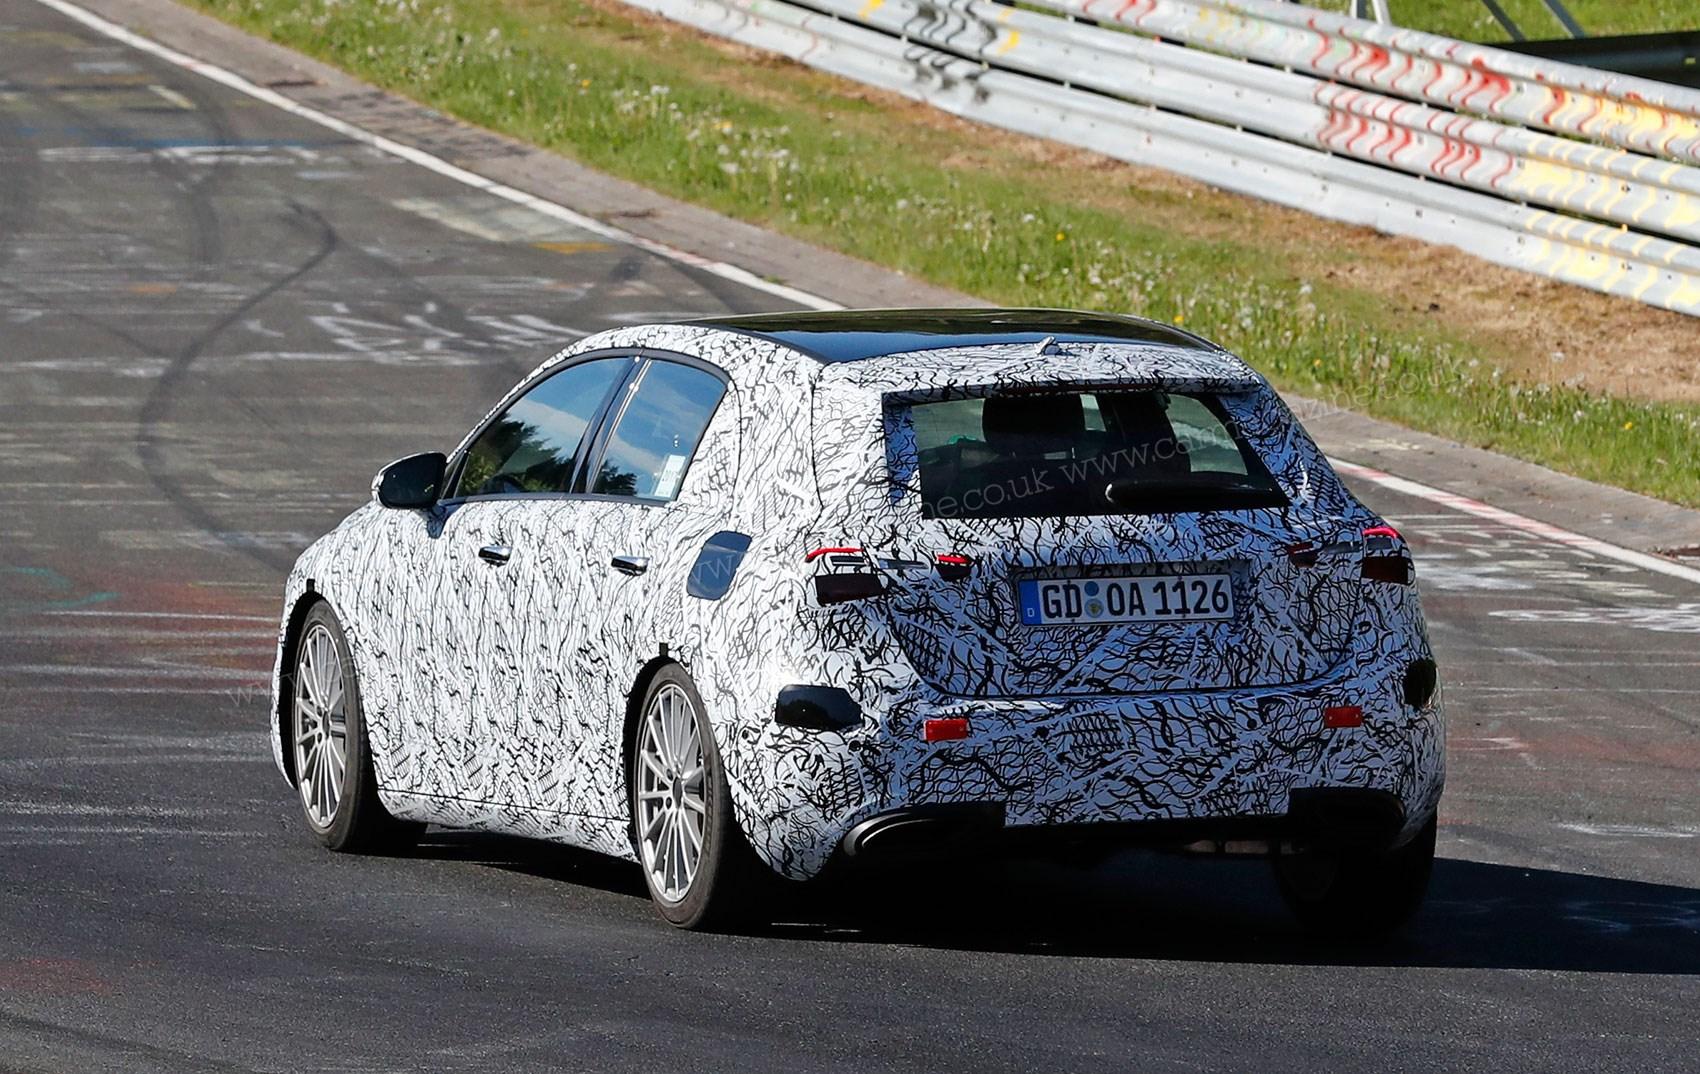 Mercedes benz a class spyshots by car magazine for New mercedes benz a class